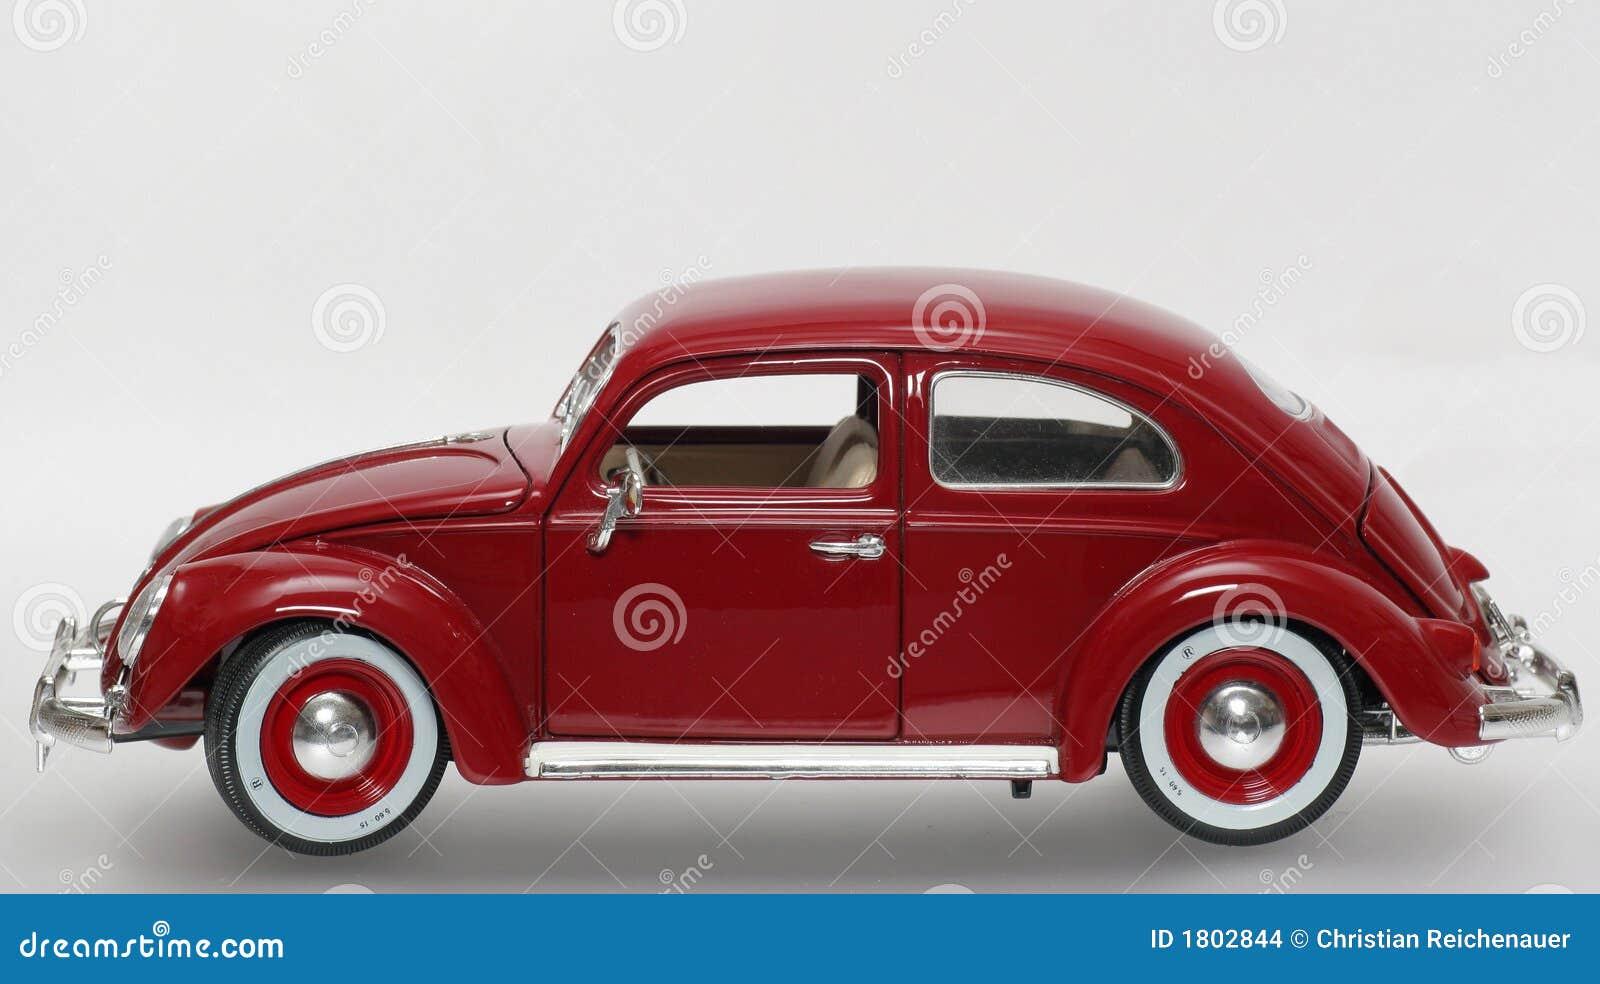 Del Metal 1955 La De Juguete Sideview Beatle Modelo Vw Escala LA4Rj35q